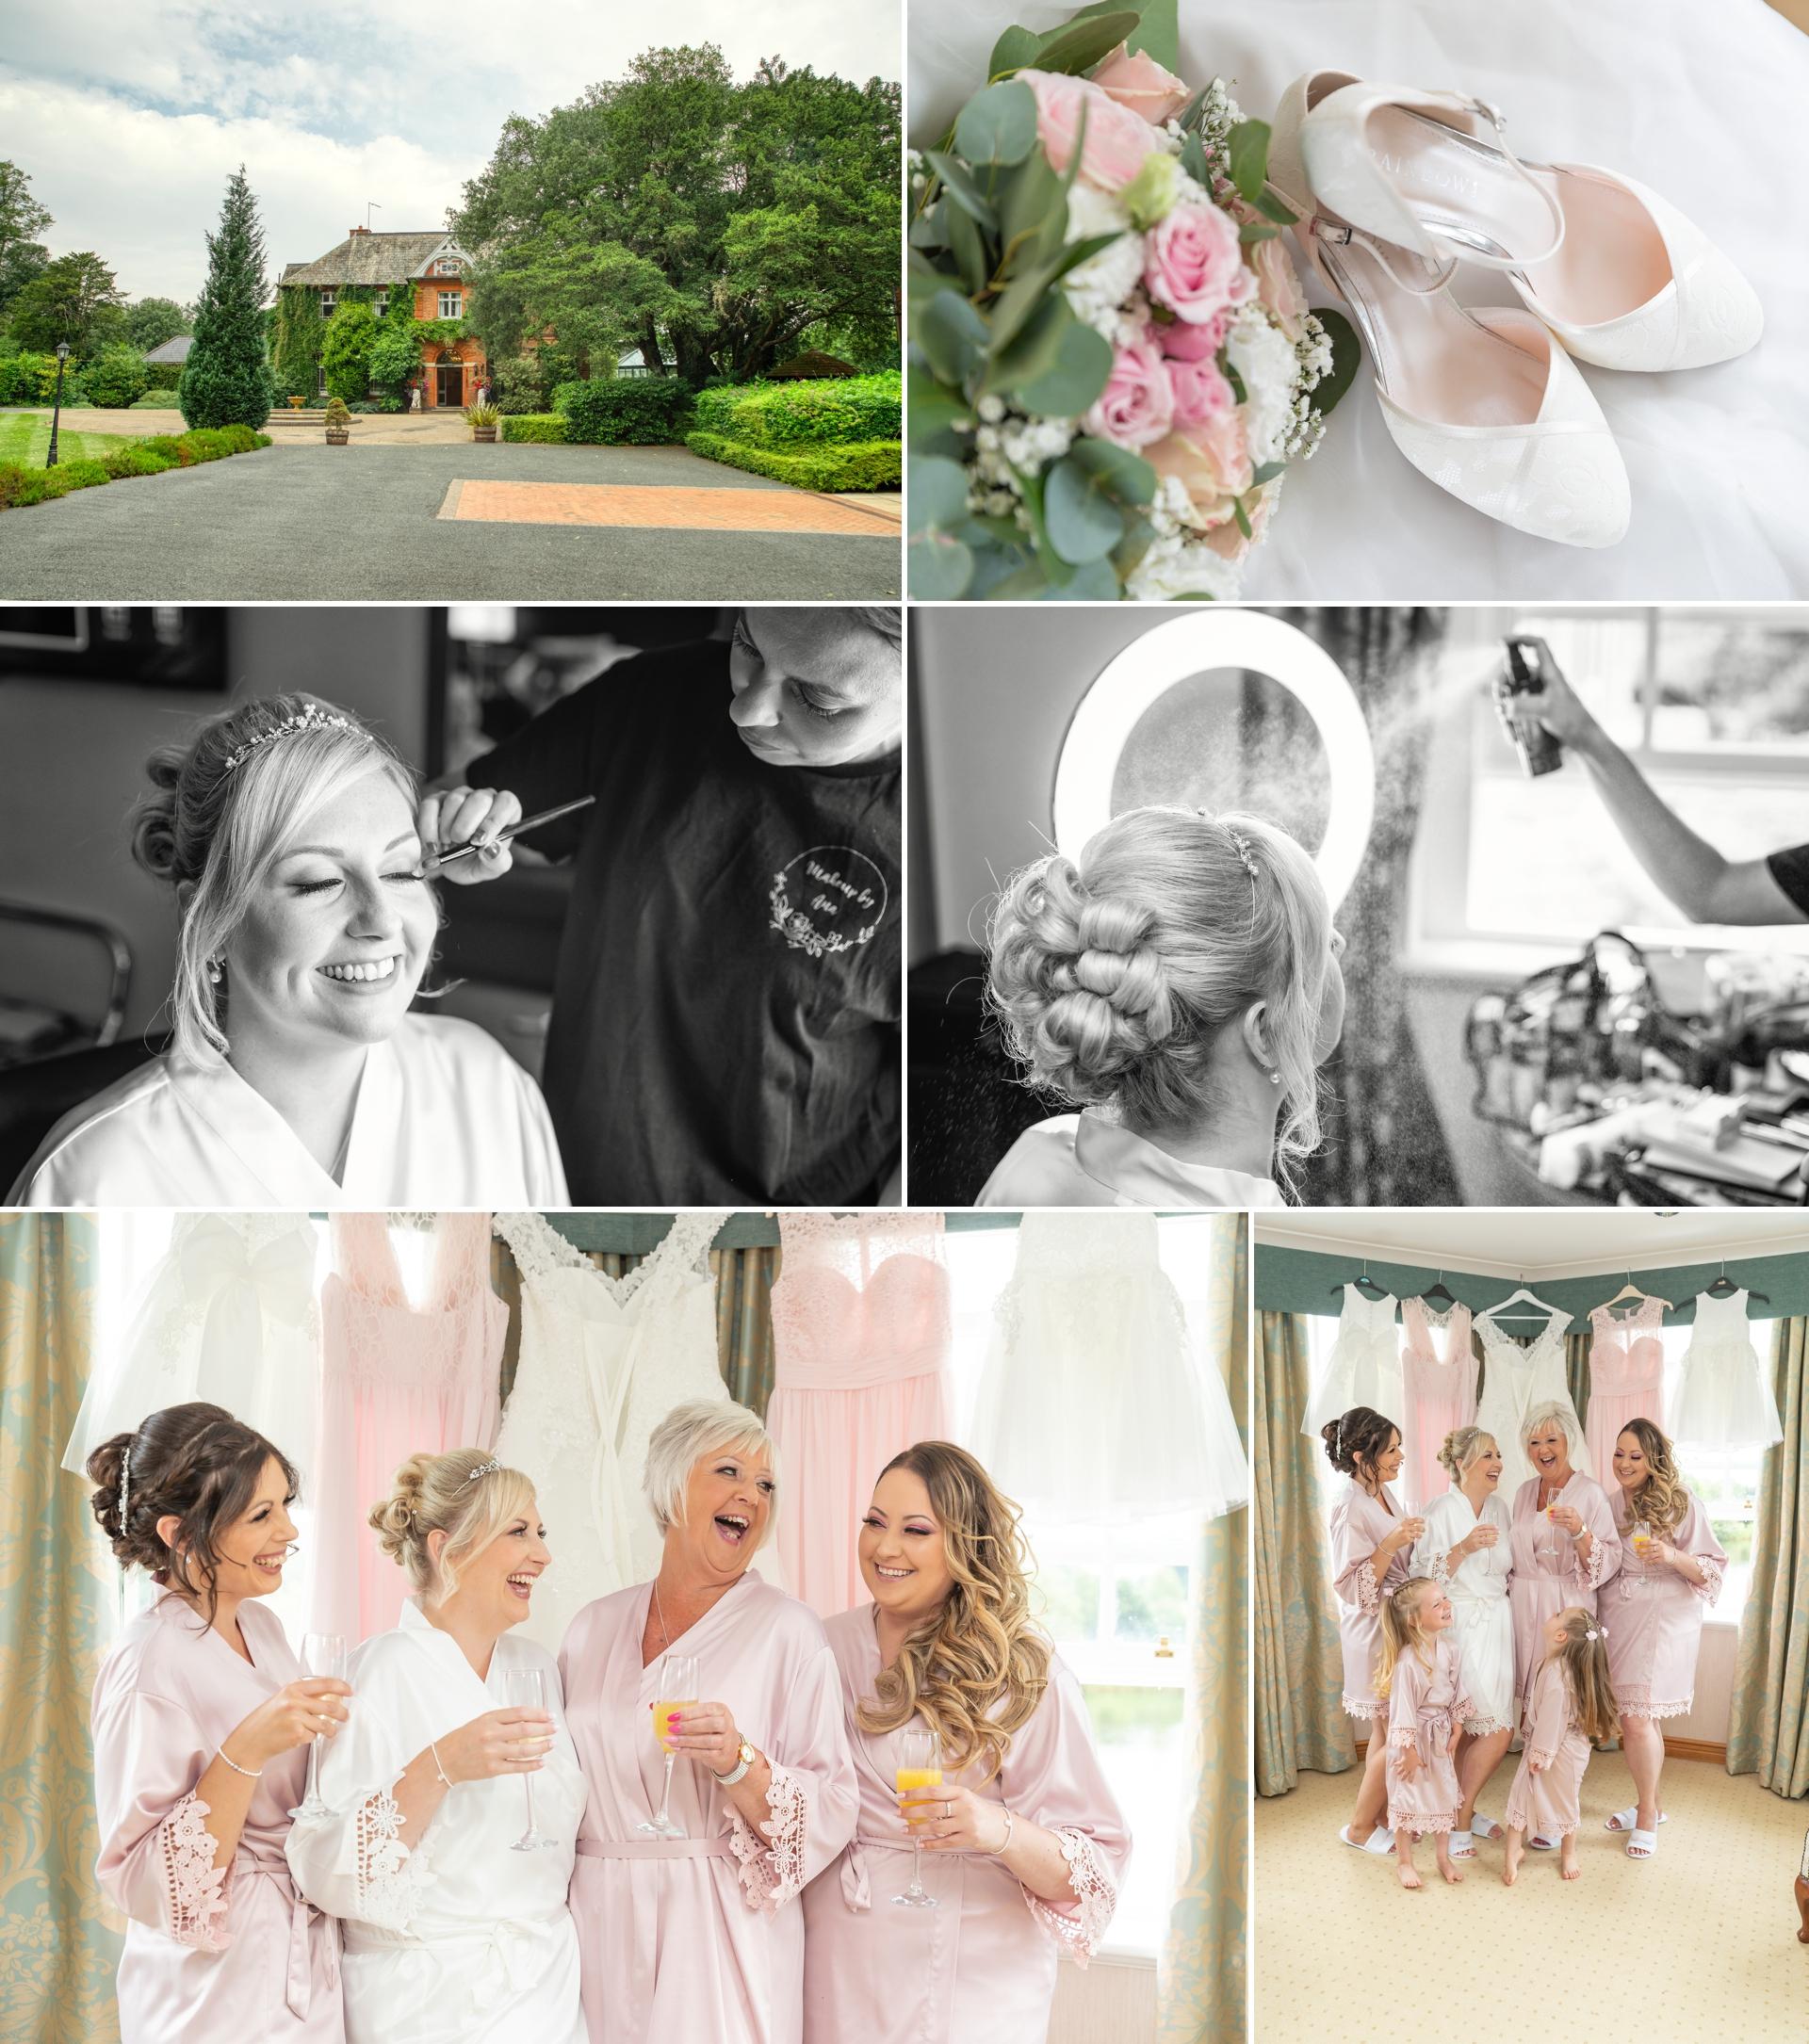 Bridal preparation at Ardencote manor